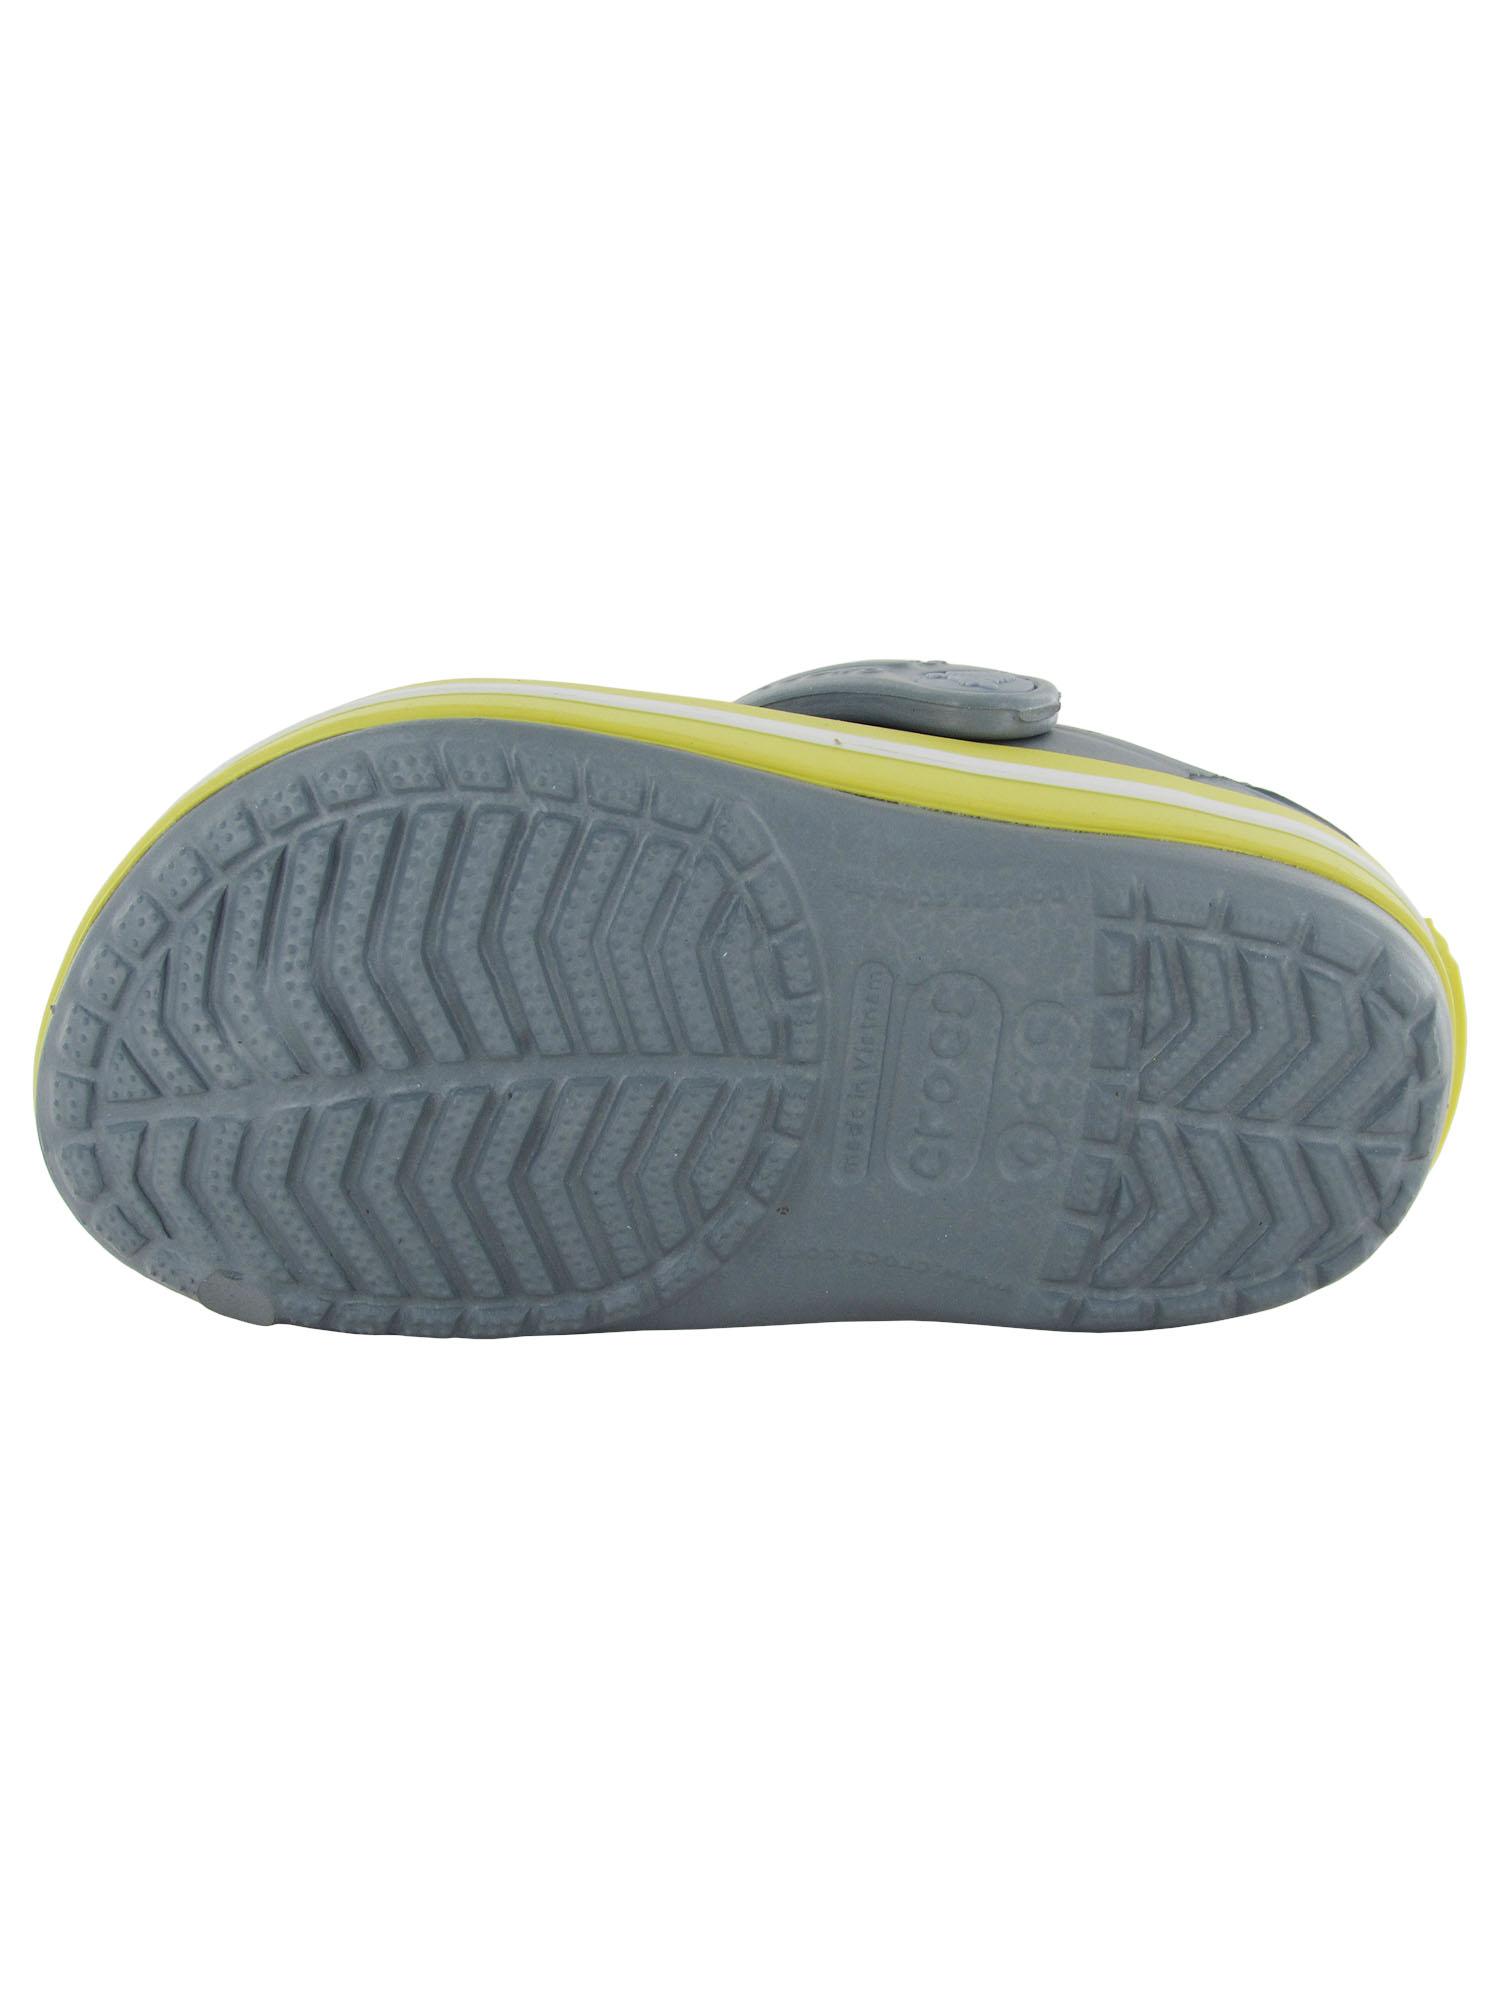 Crocs-Crocband-Kids-Slip-On-Clog-Shoes thumbnail 3